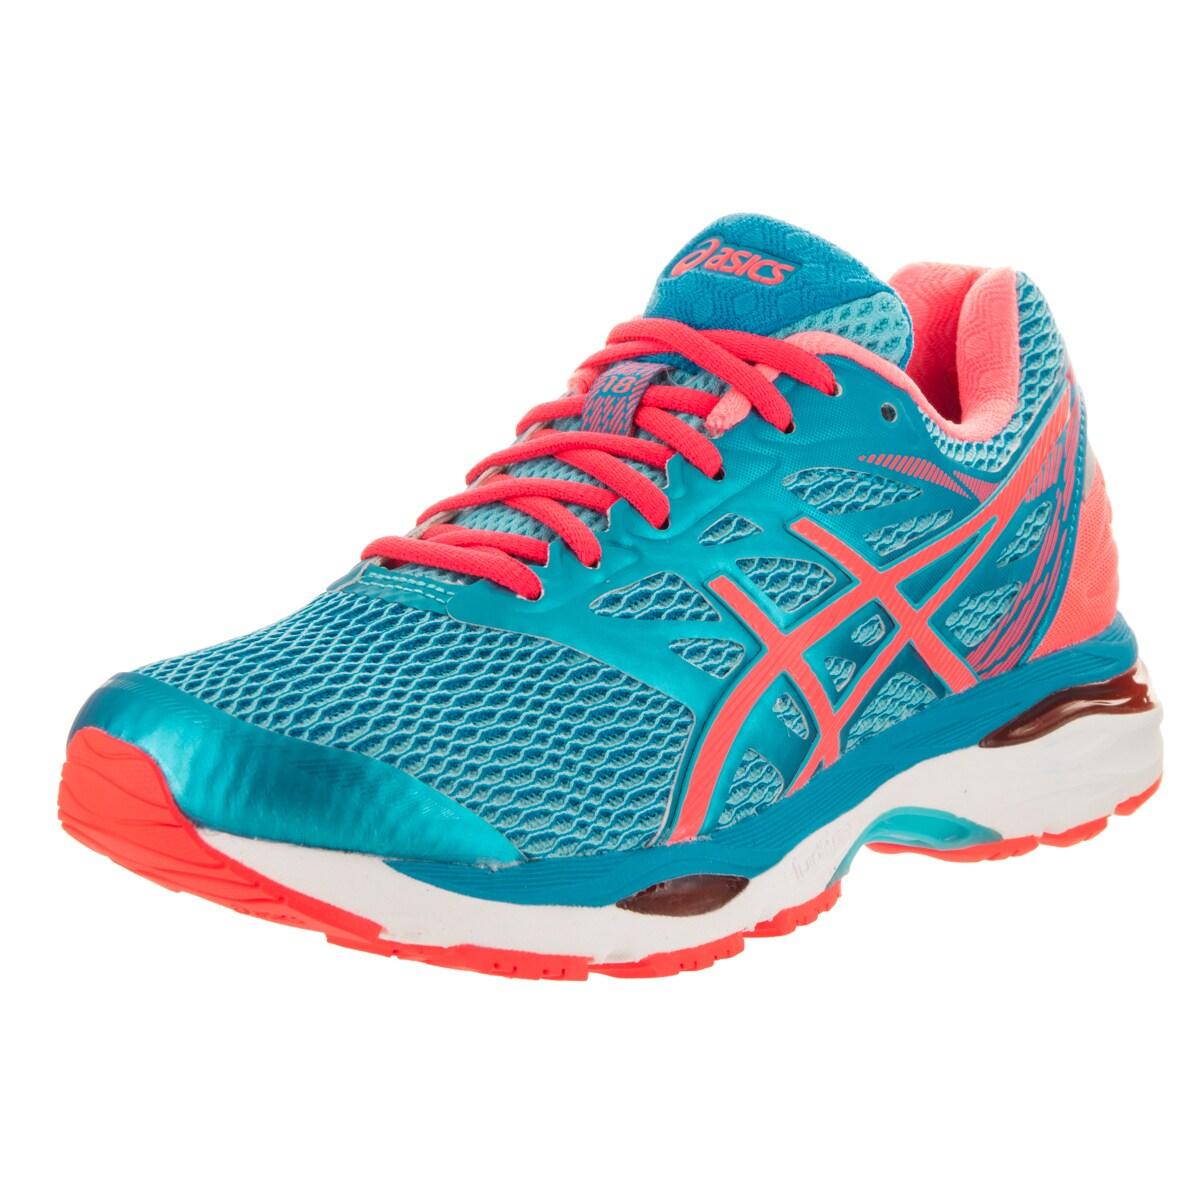 Shop Asics Women s Gel-Cumulus 18 Blue Running Shoes - Free Shipping ... 619ee4570c